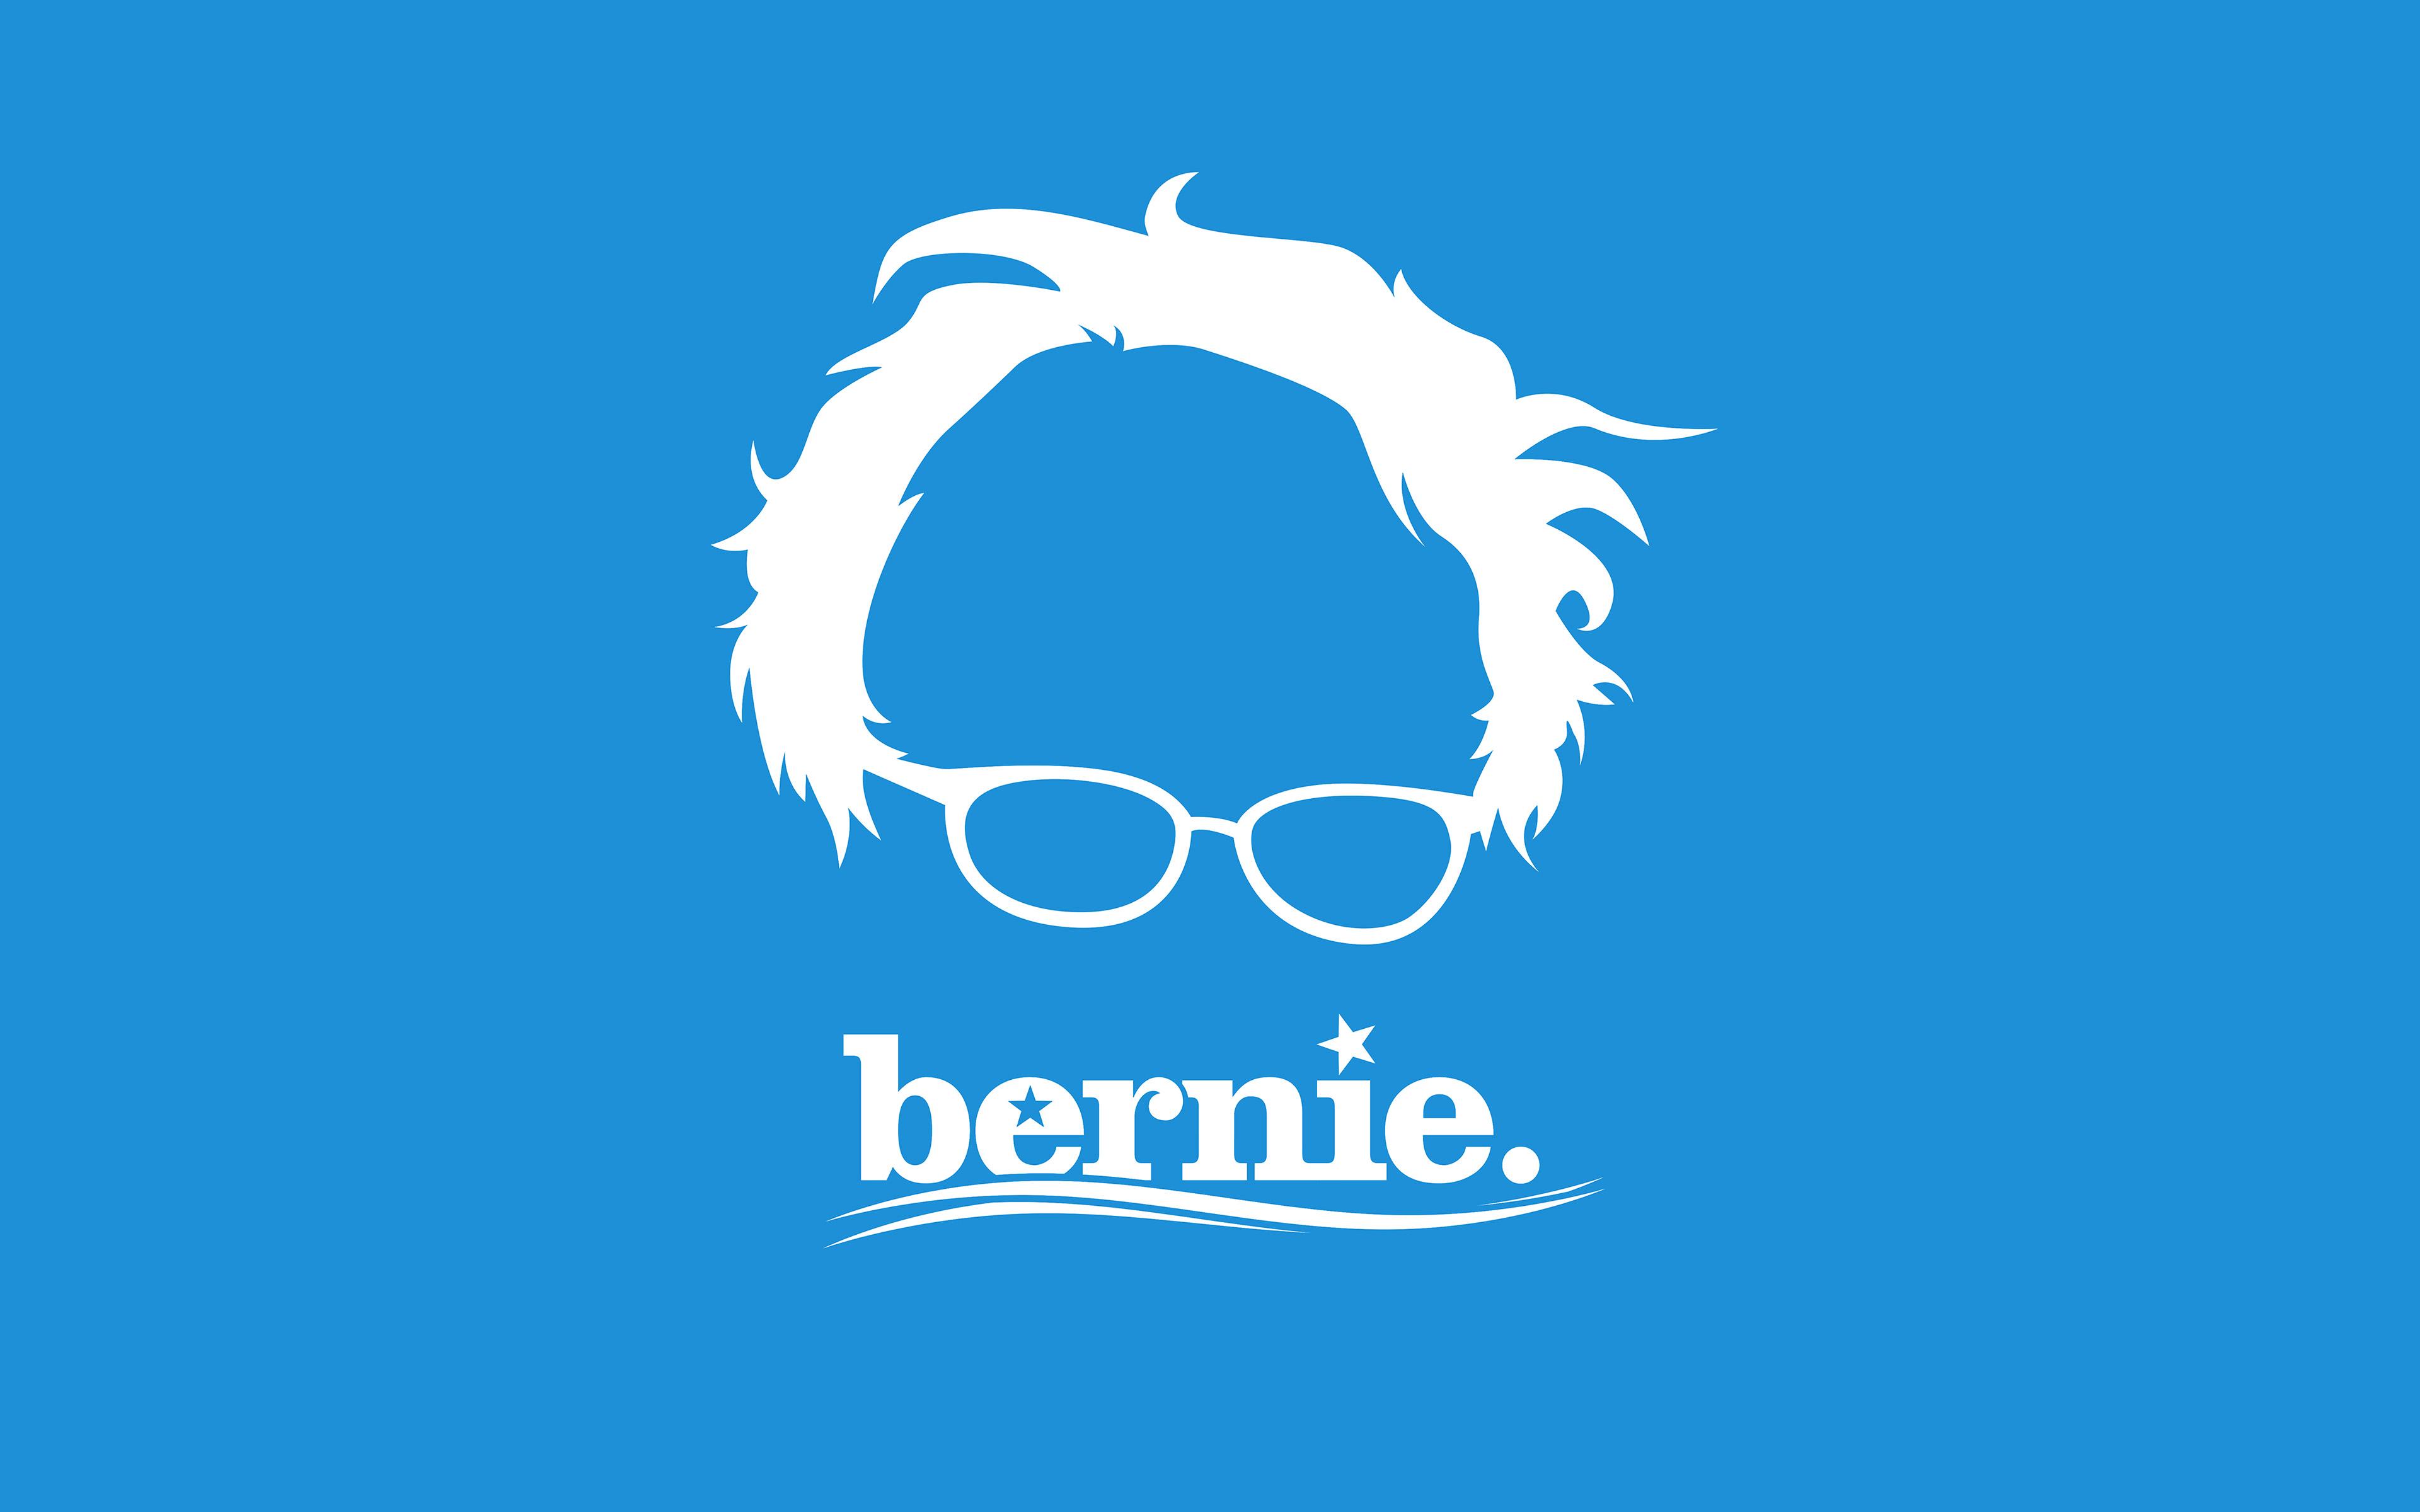 Bernie Sanders Wallpaper Download: 3840 X 2400